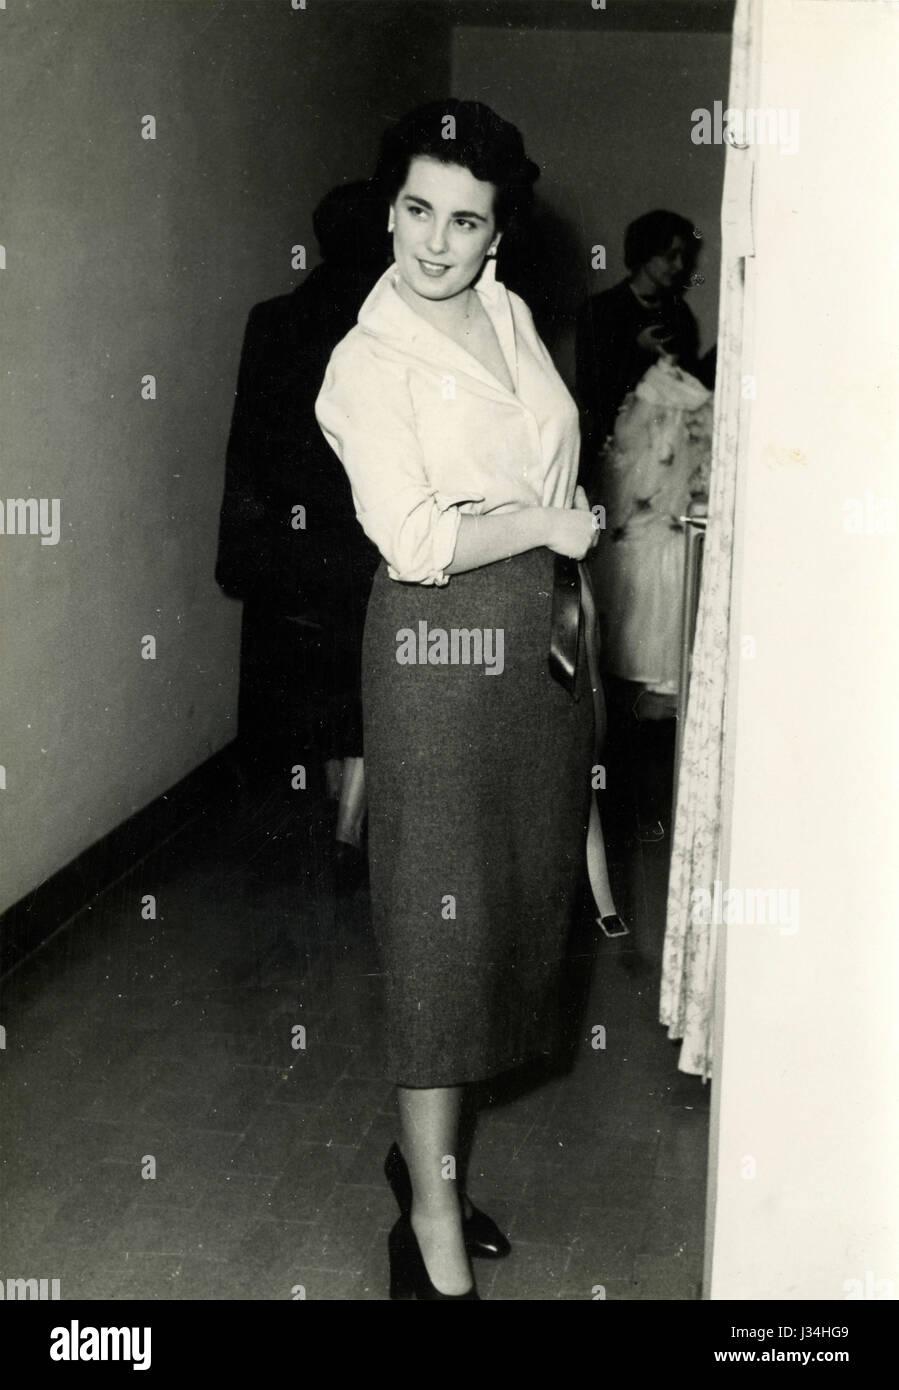 Dressing model, Italy ca. 1950 - Stock Image